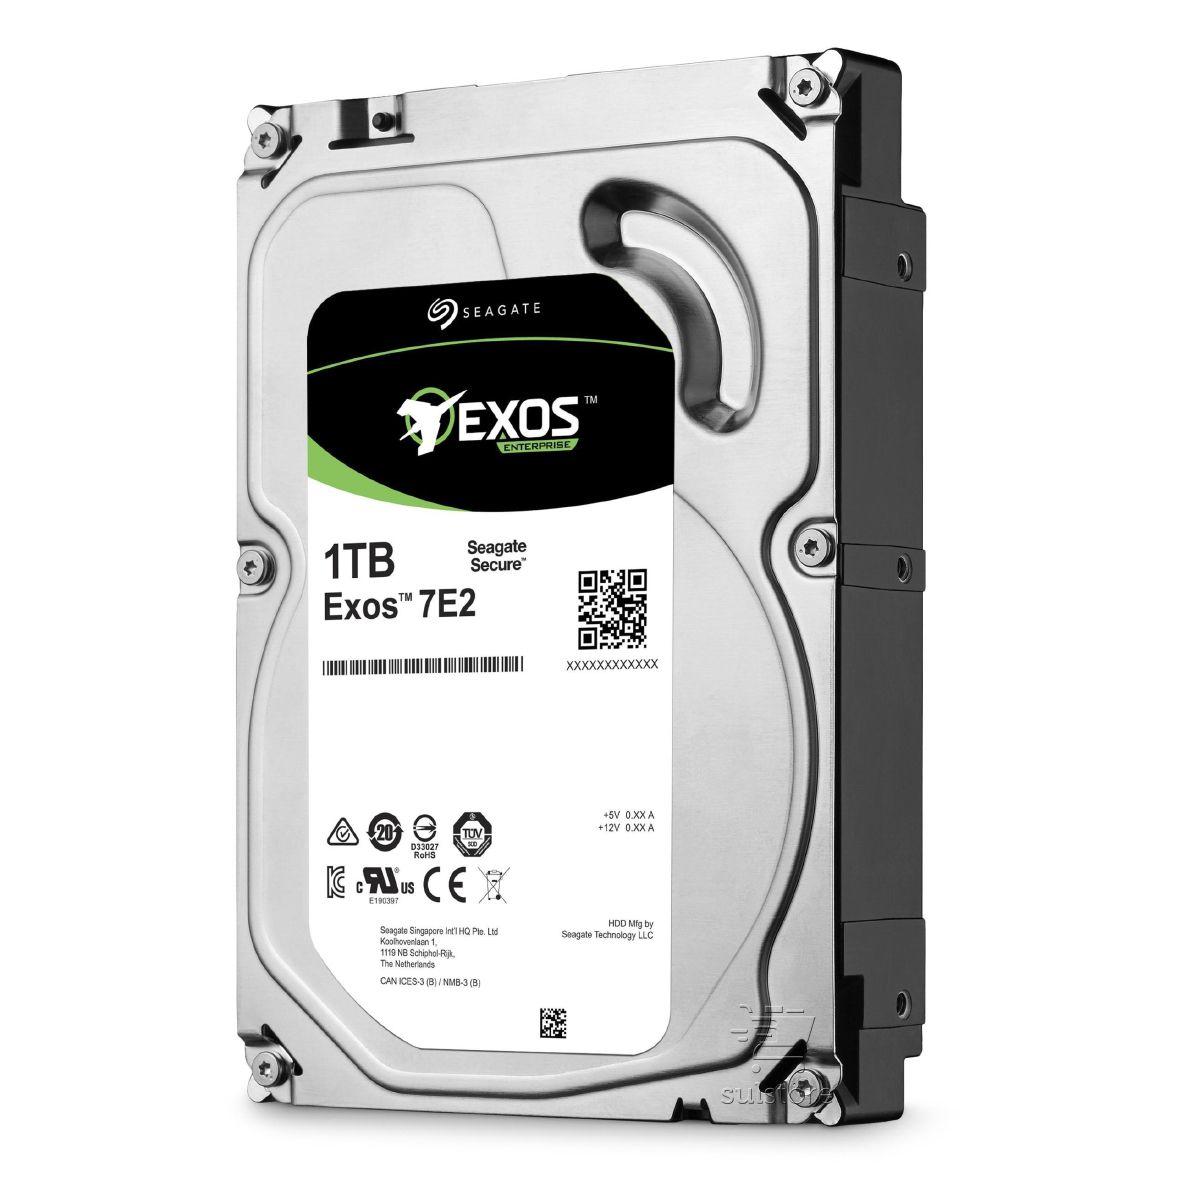 HD 1TB Sata Seagate Exos Enterprise Servidor 3,5 24x7 ST1000NM0008